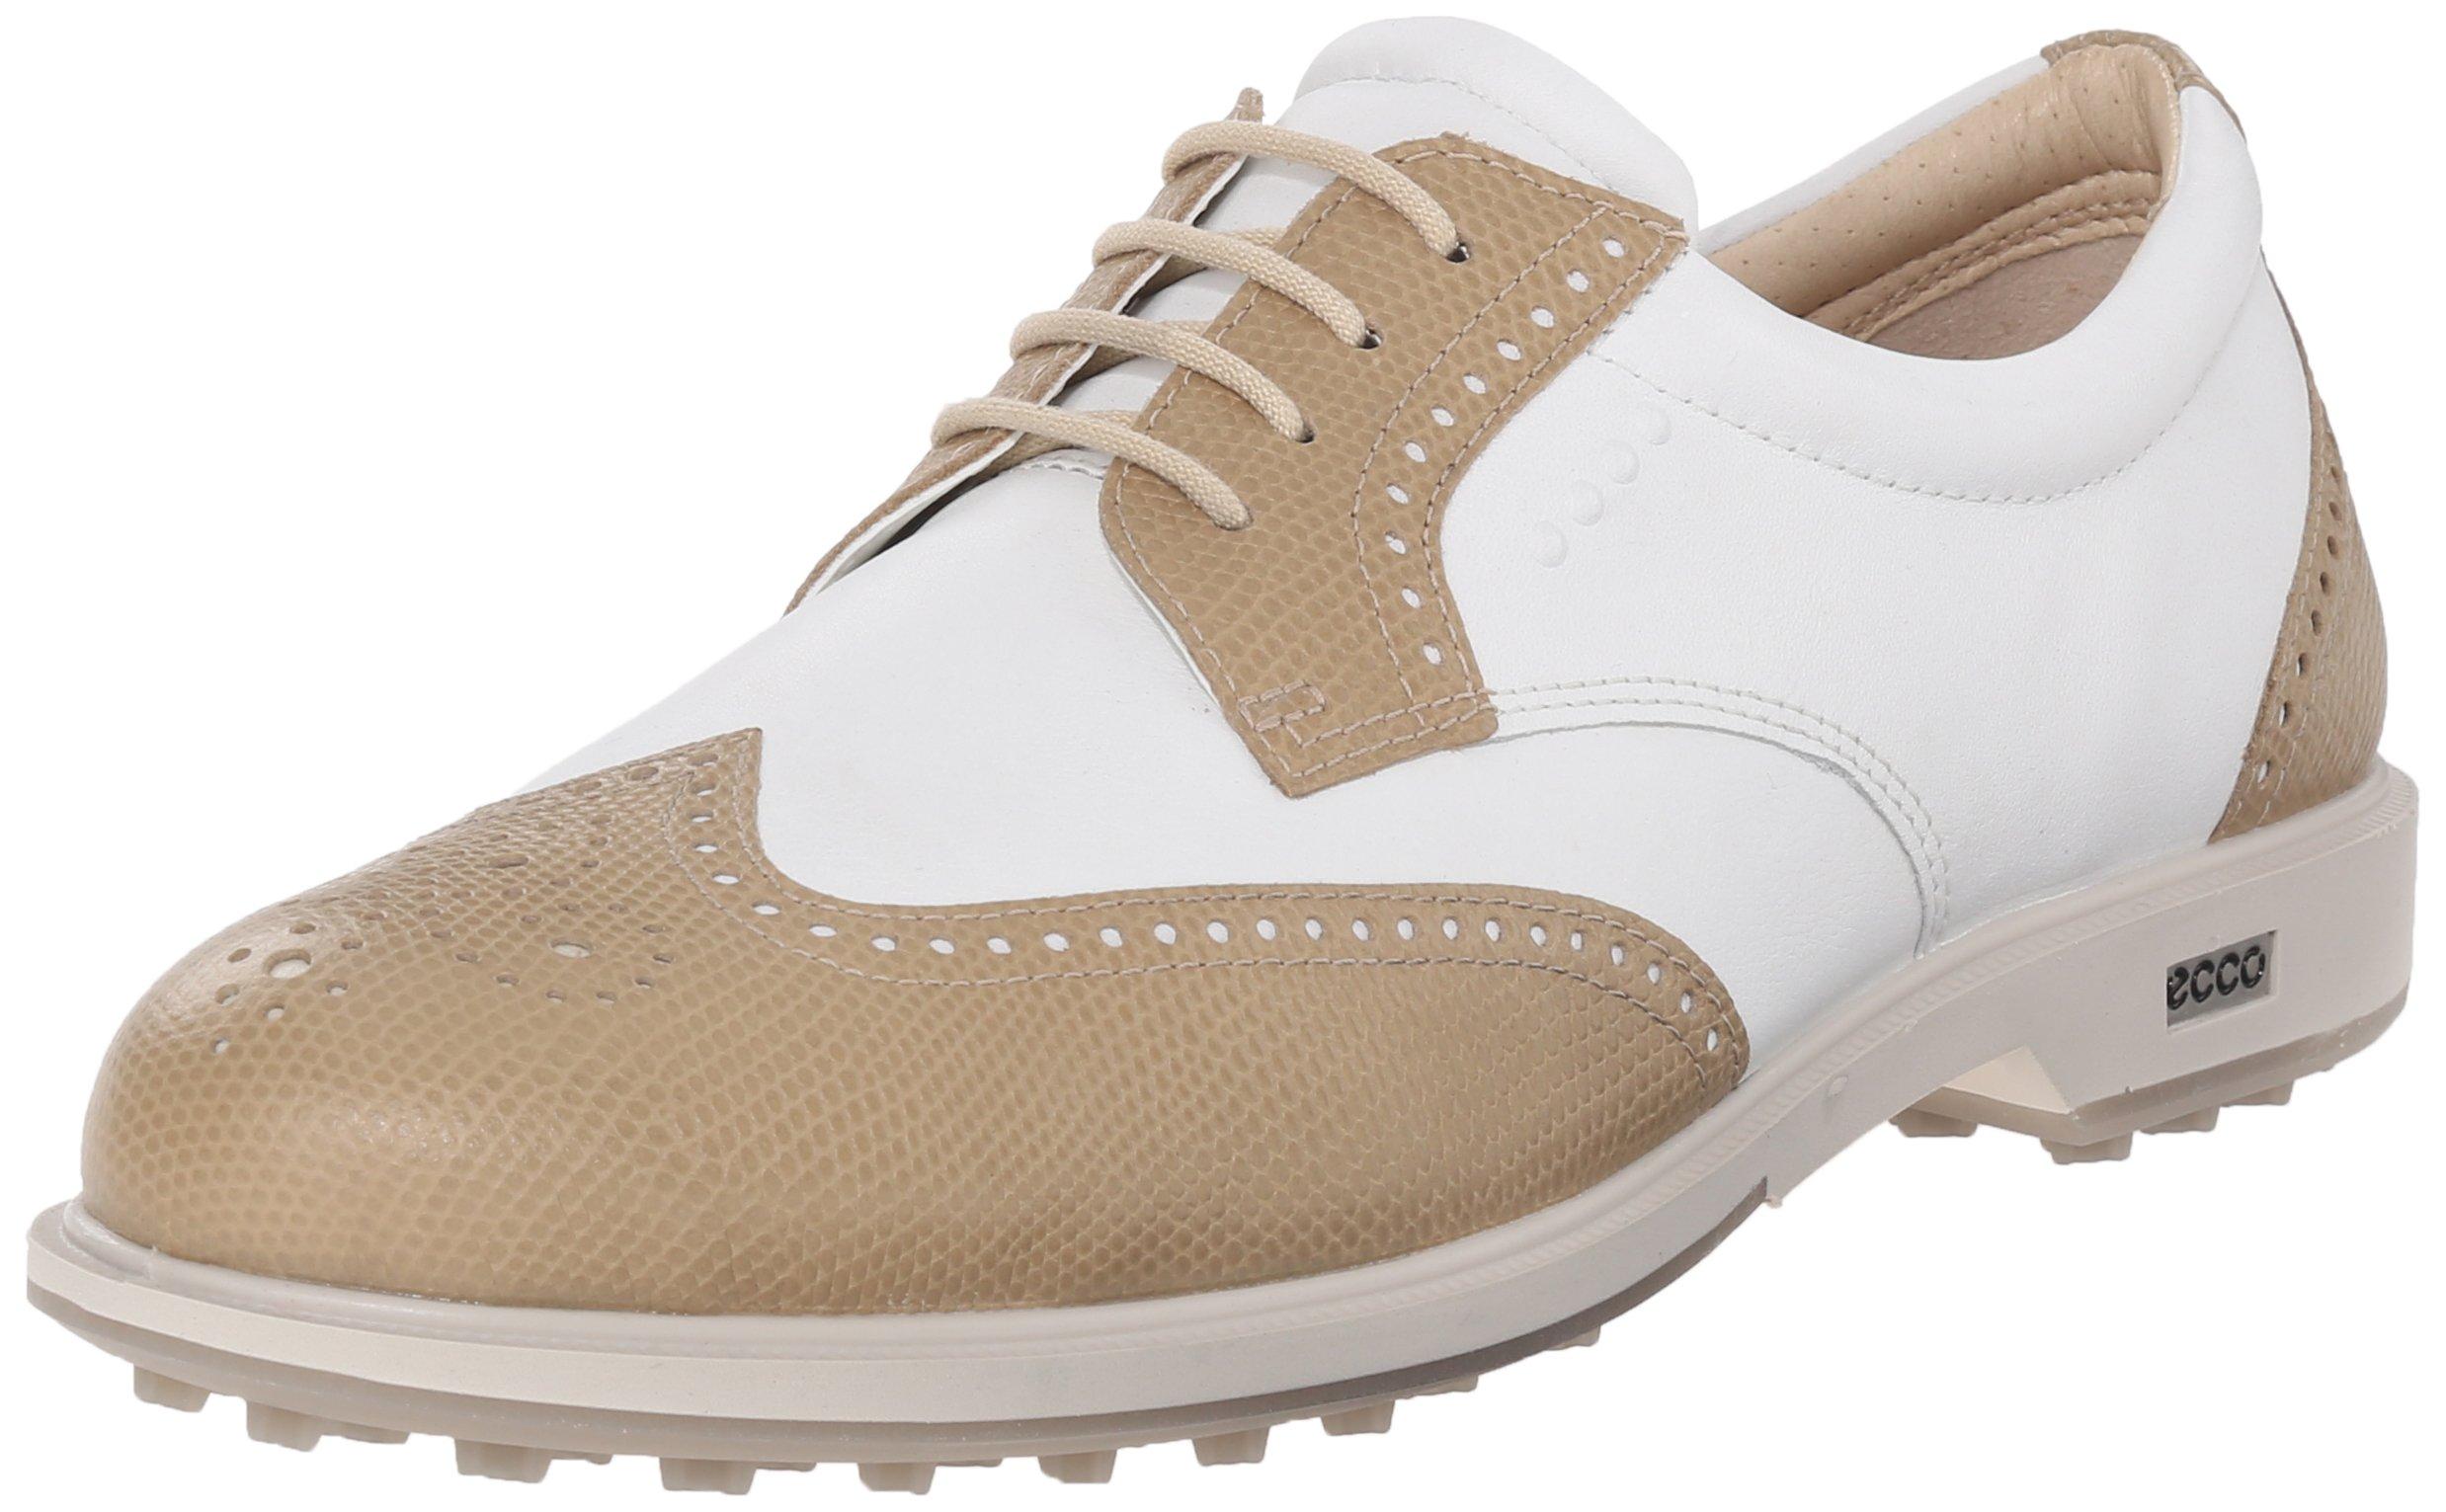 ECCO Women's Classic Hybrid Golf Shoe, Sand/White, 41 EU/10-10.5 M US